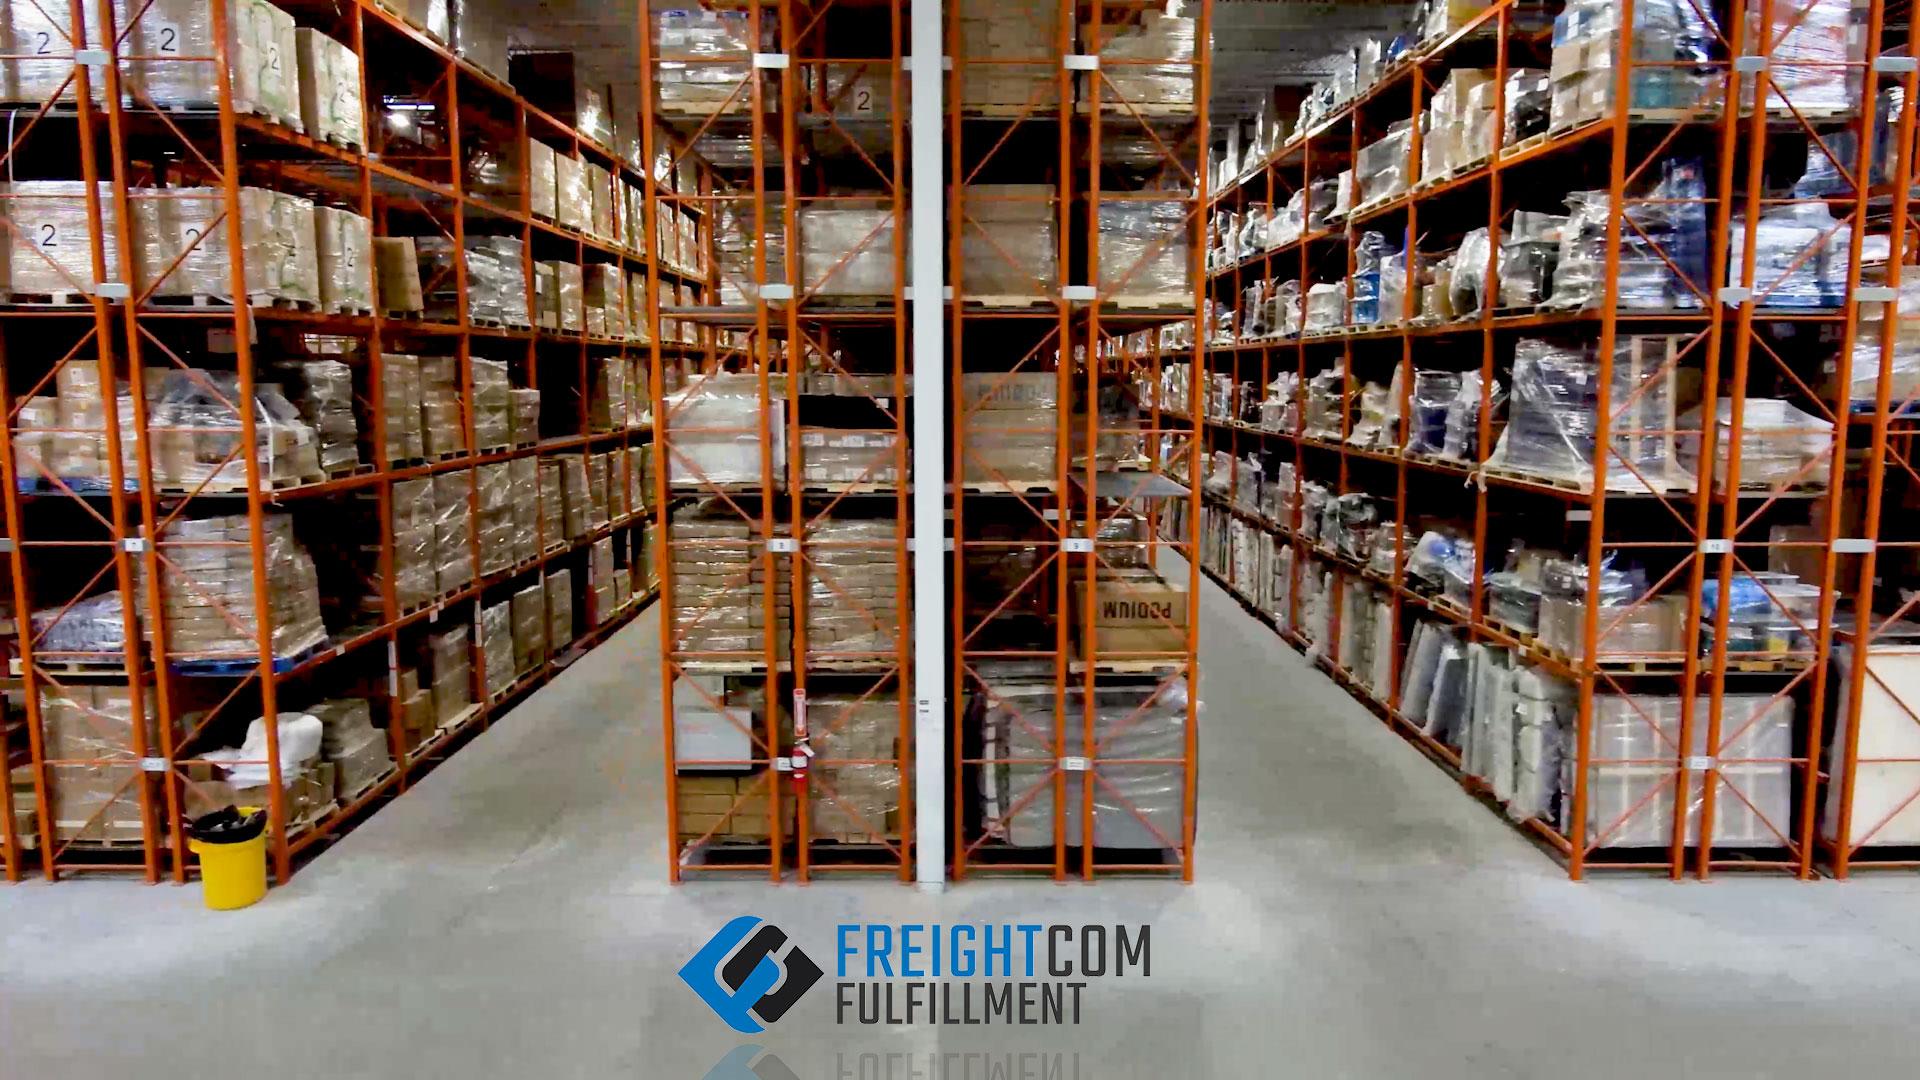 Freightcom Fulfillment is On the Horizon